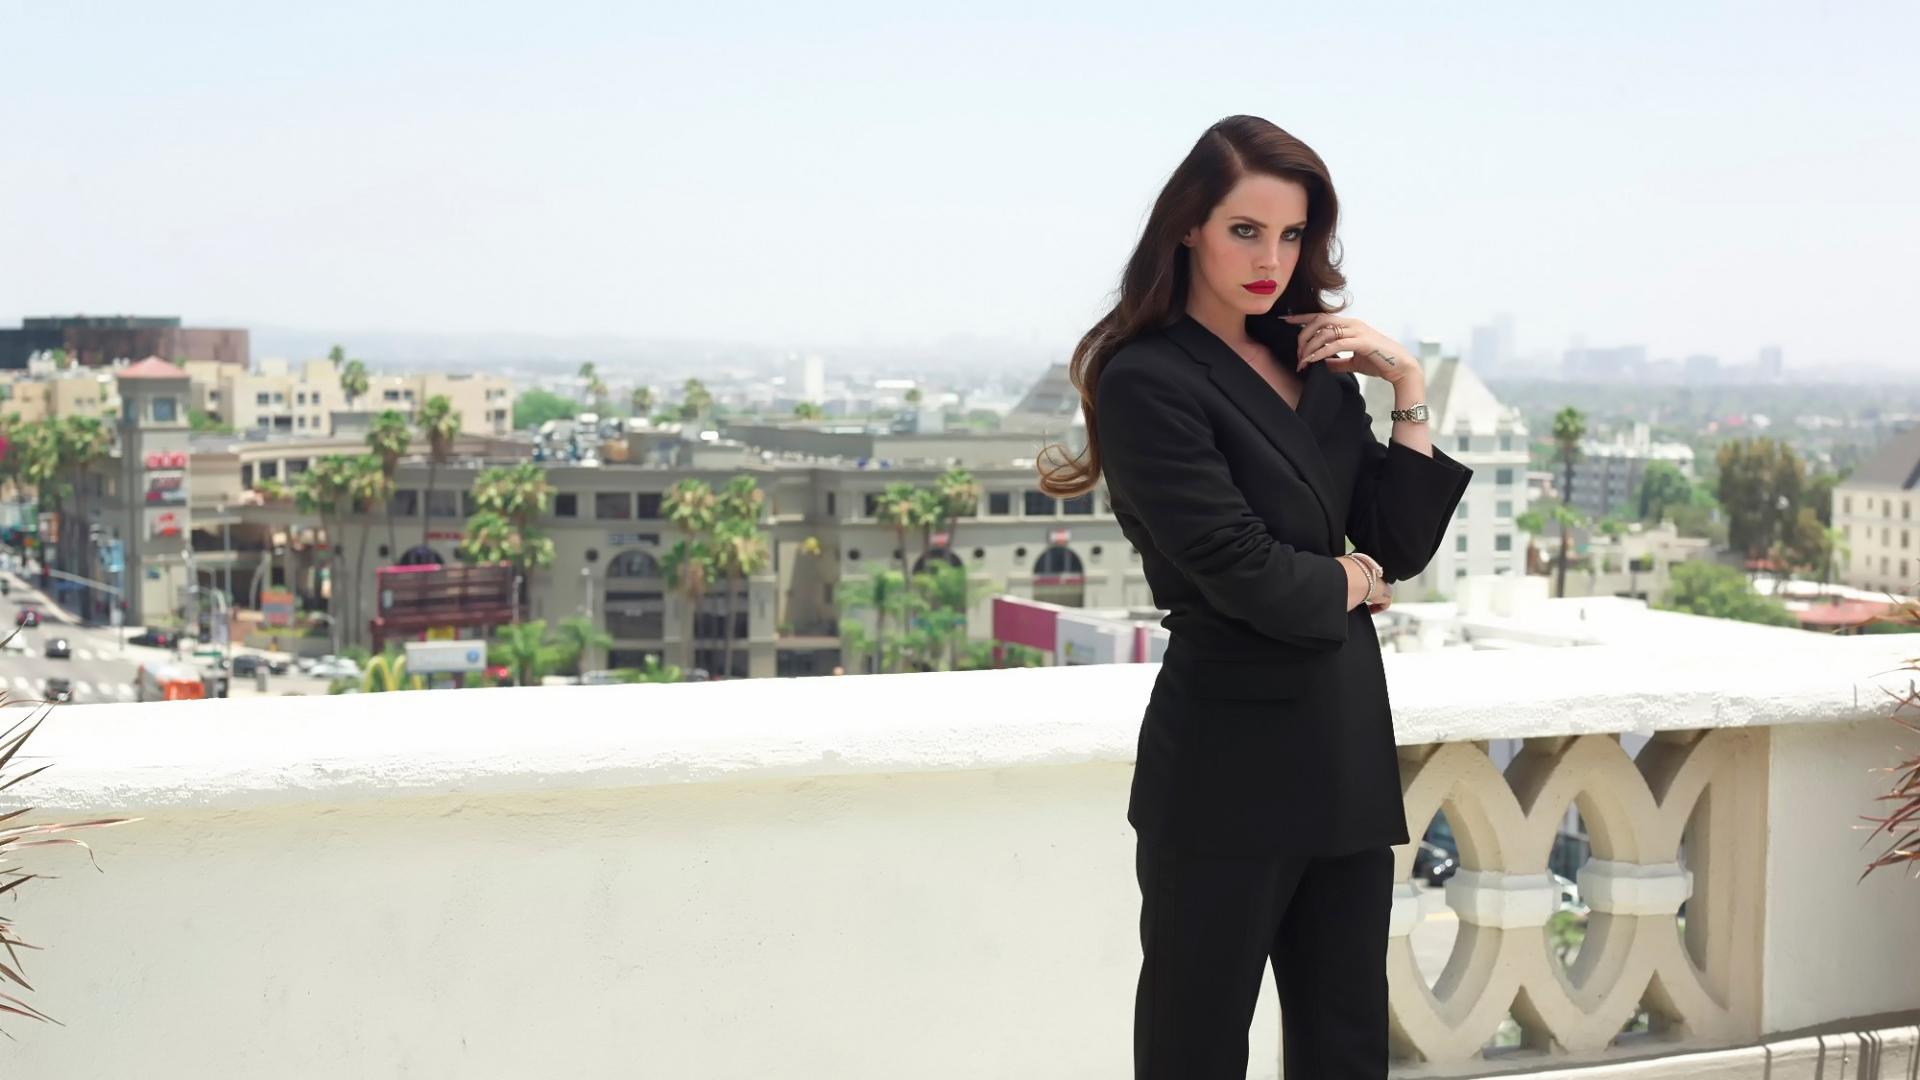 Amazing Wallpaper Mac Lana Del Rey - lana-del-rey-celebrity-wallpaper-53284-55011-hd-wallpapers  Collection_428070.jpg